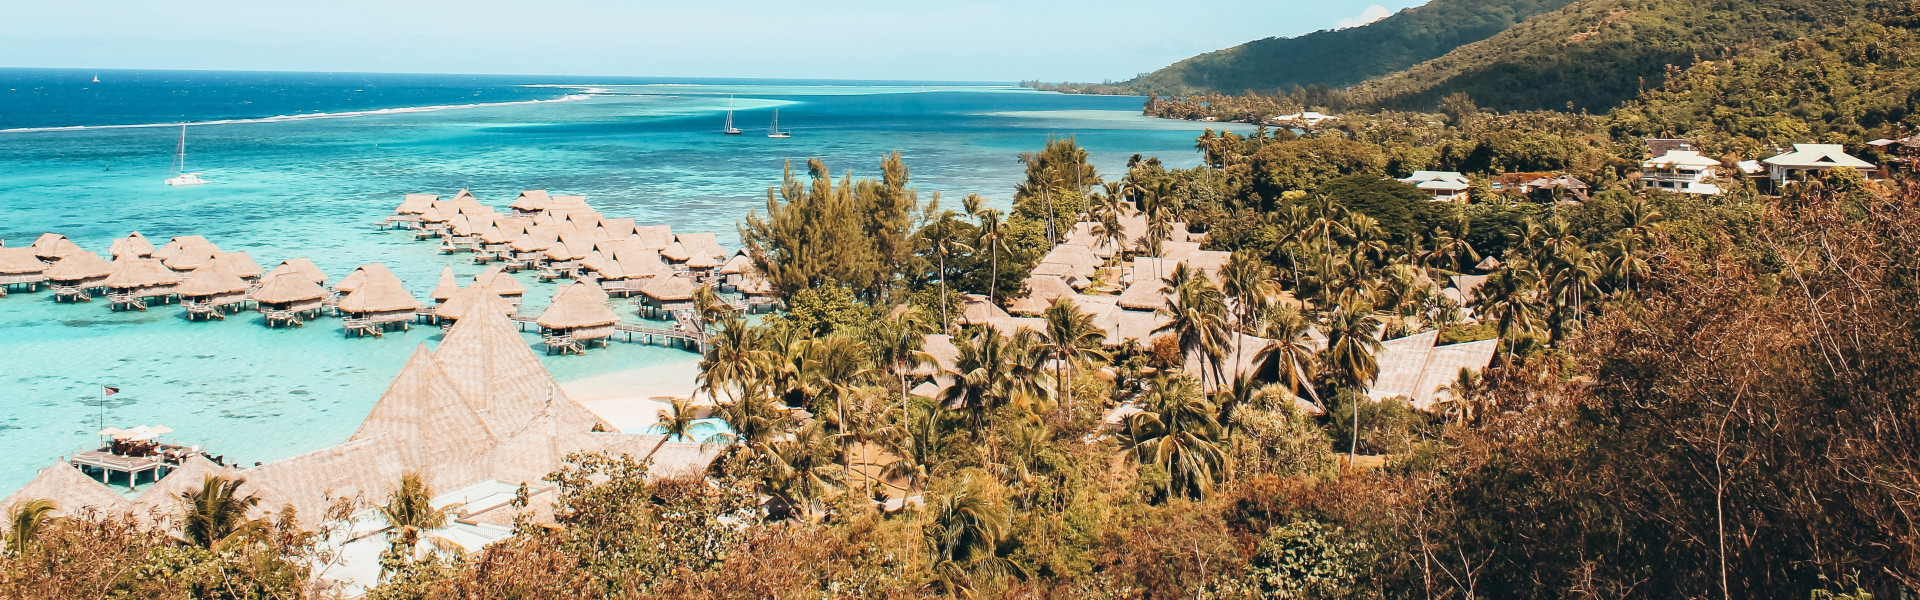 Main image ofVoyage idyllique en Polynésie